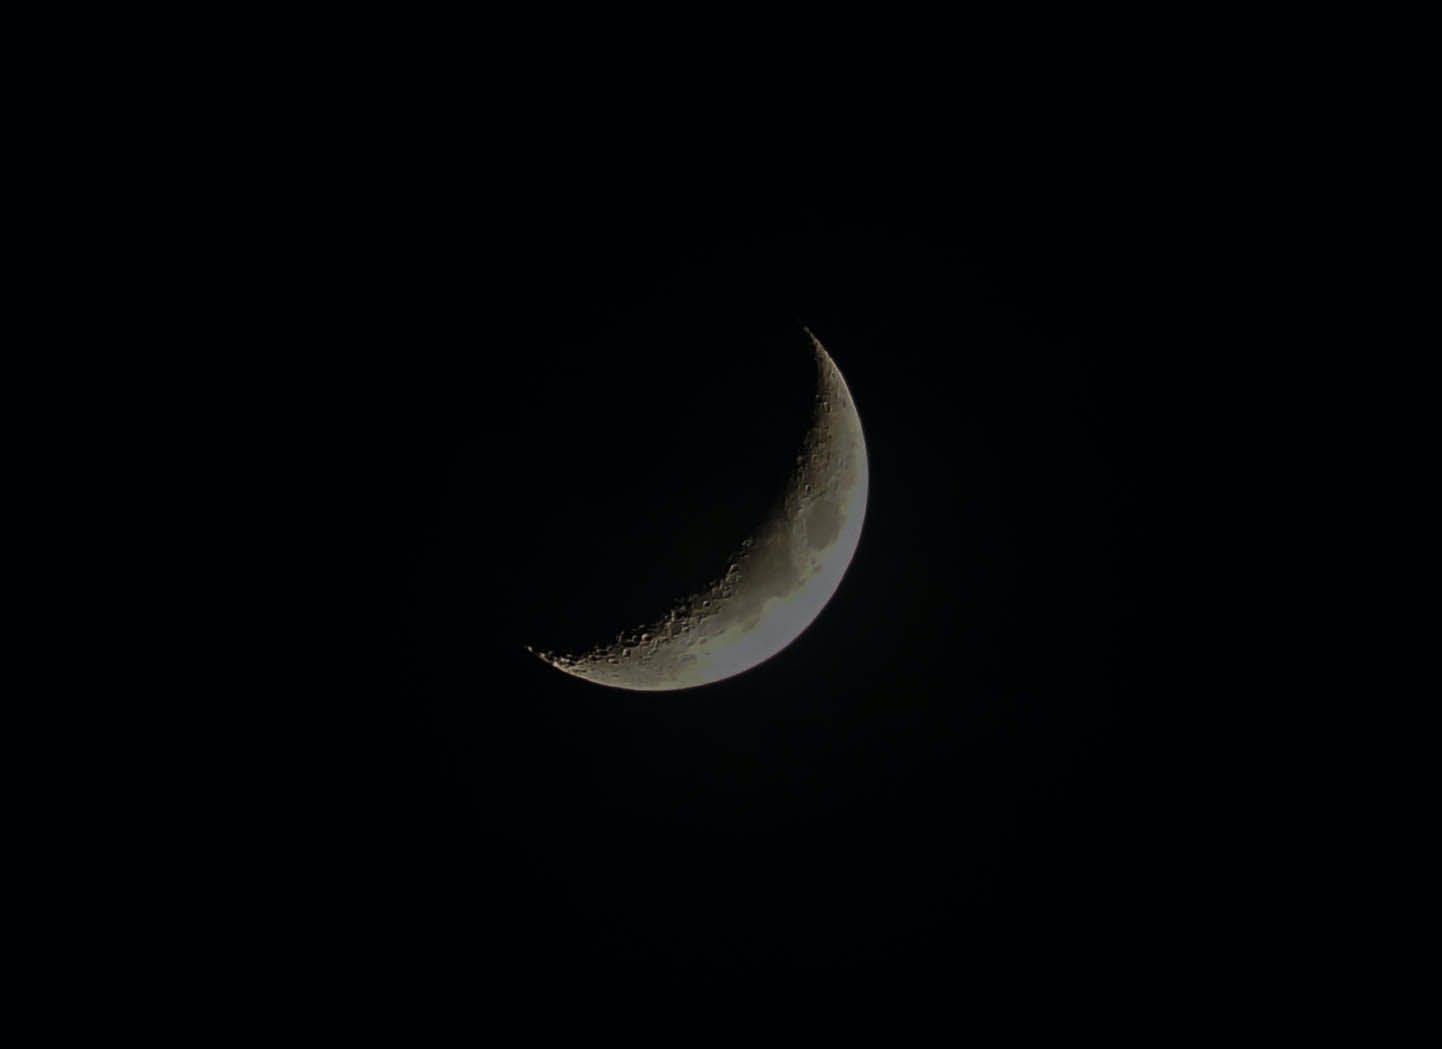 Half Moon Wallpaper Free Stock Photo